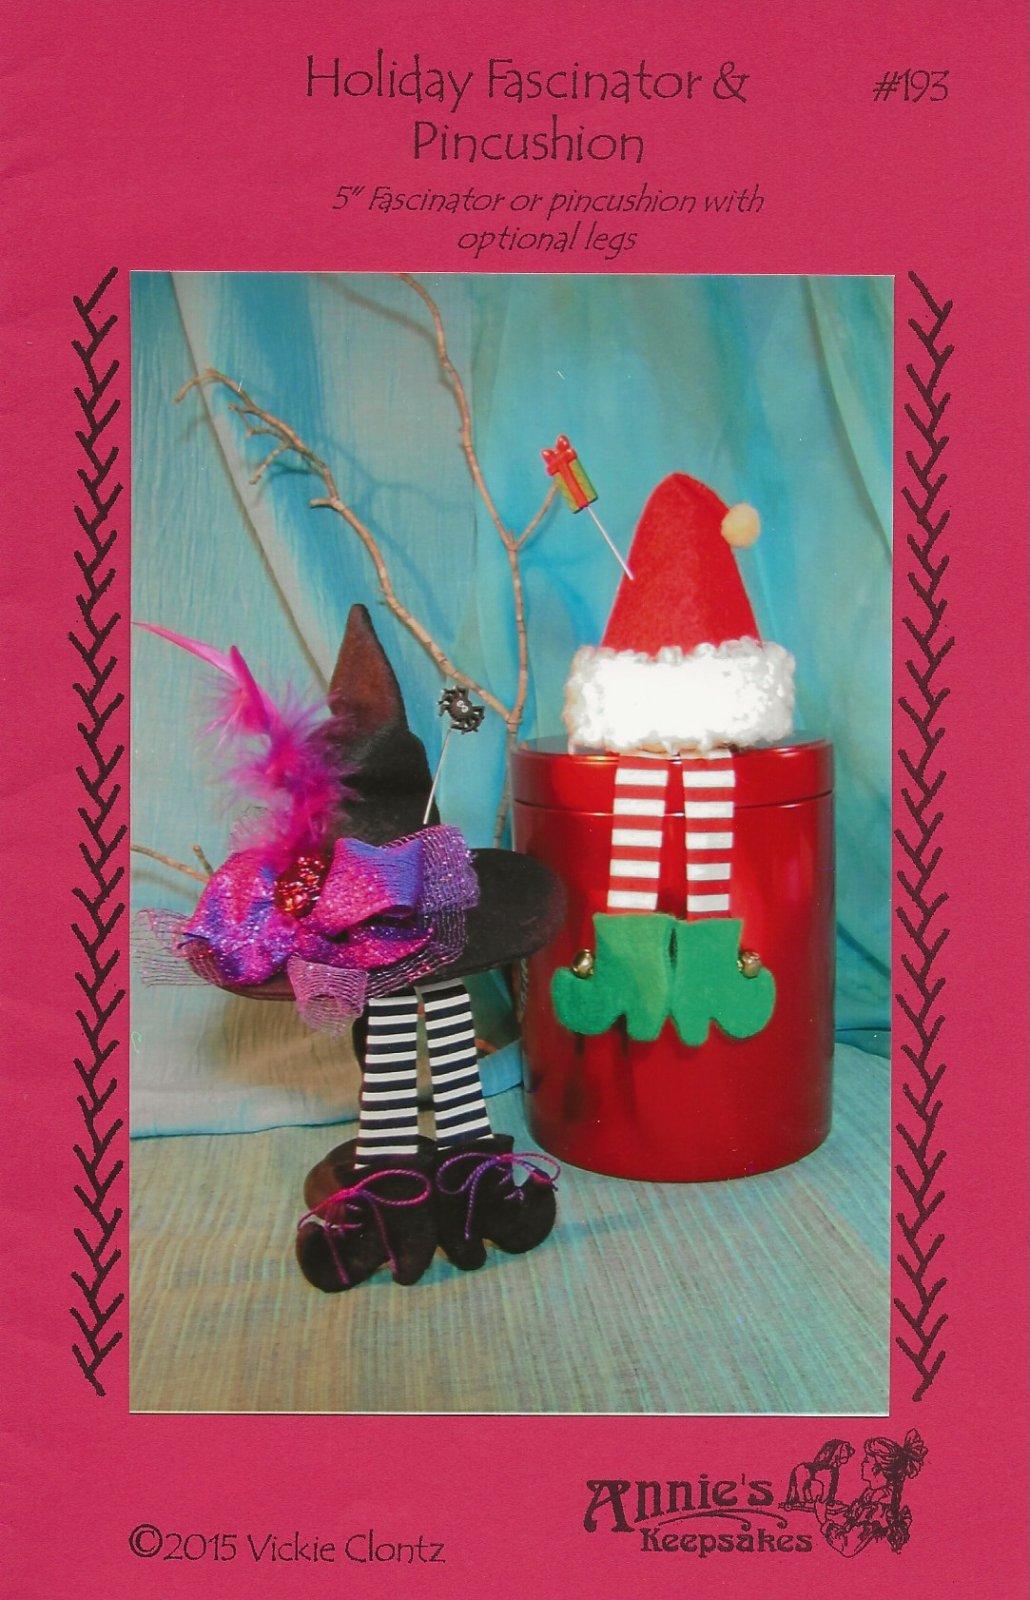 Holiday Fascinator & Pincushion